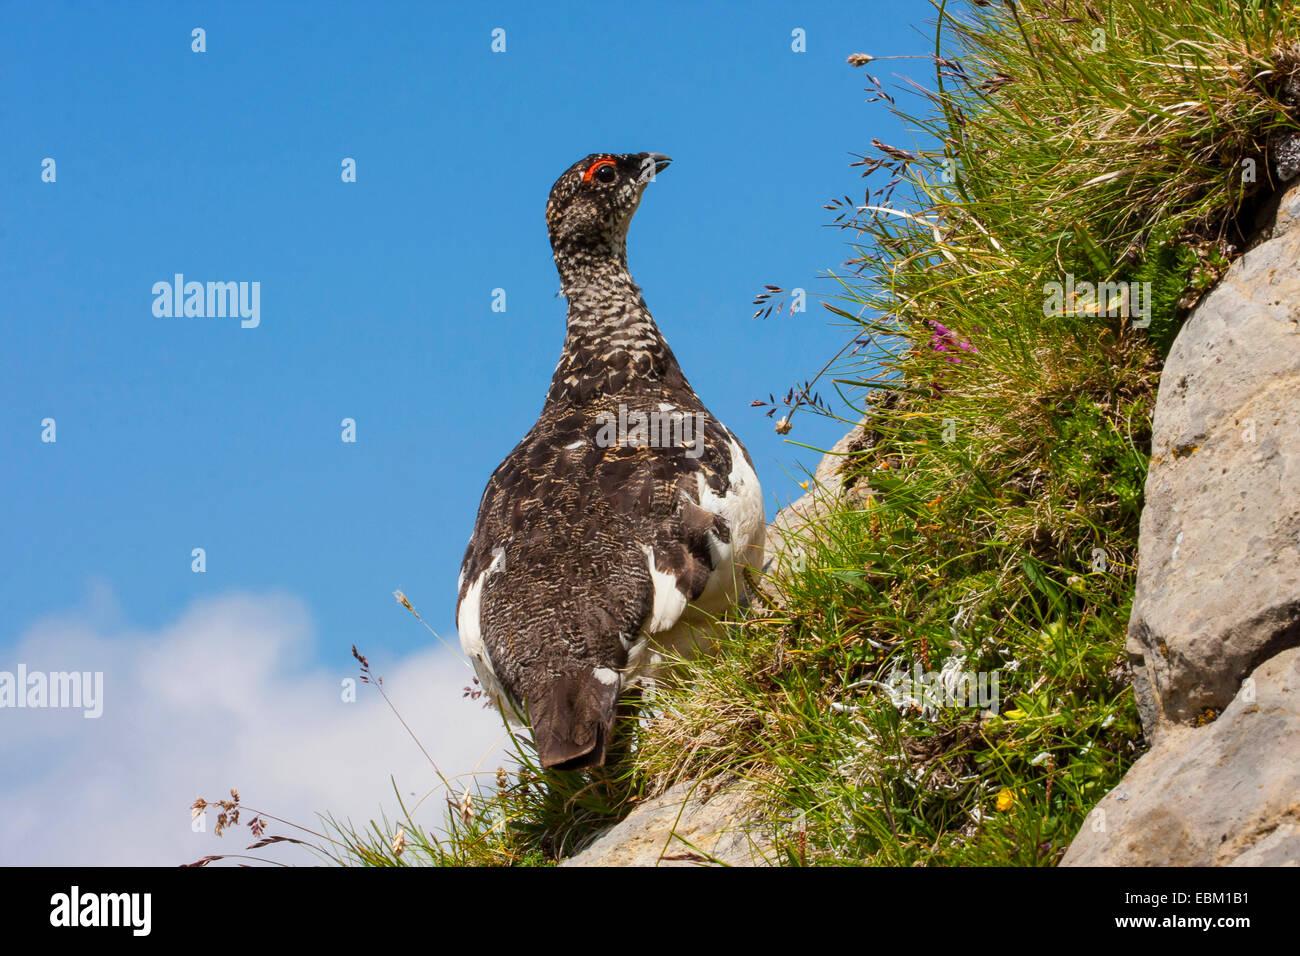 Rock ptarmigan, Snow chicken (Lagopus mutus), Switzerland, Alpstein, Saentis - Stock Image